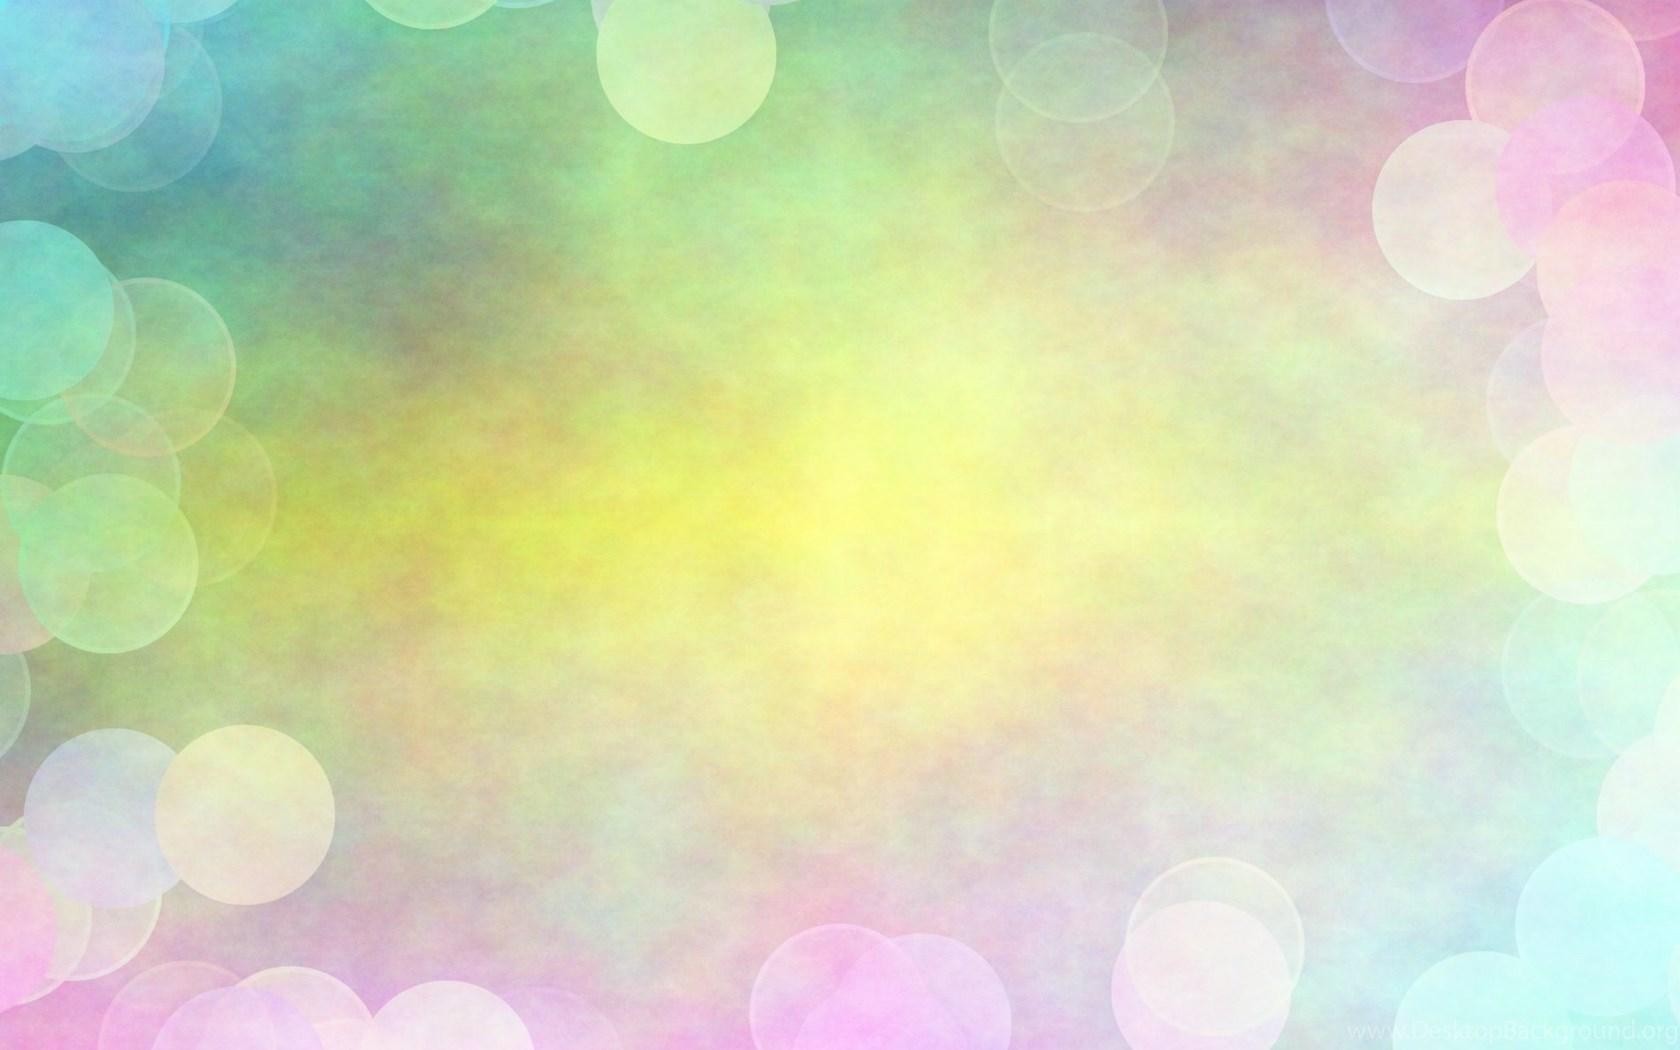 Pastel Rainbow Wallpapers HD Resolution For Desktop Uncalke